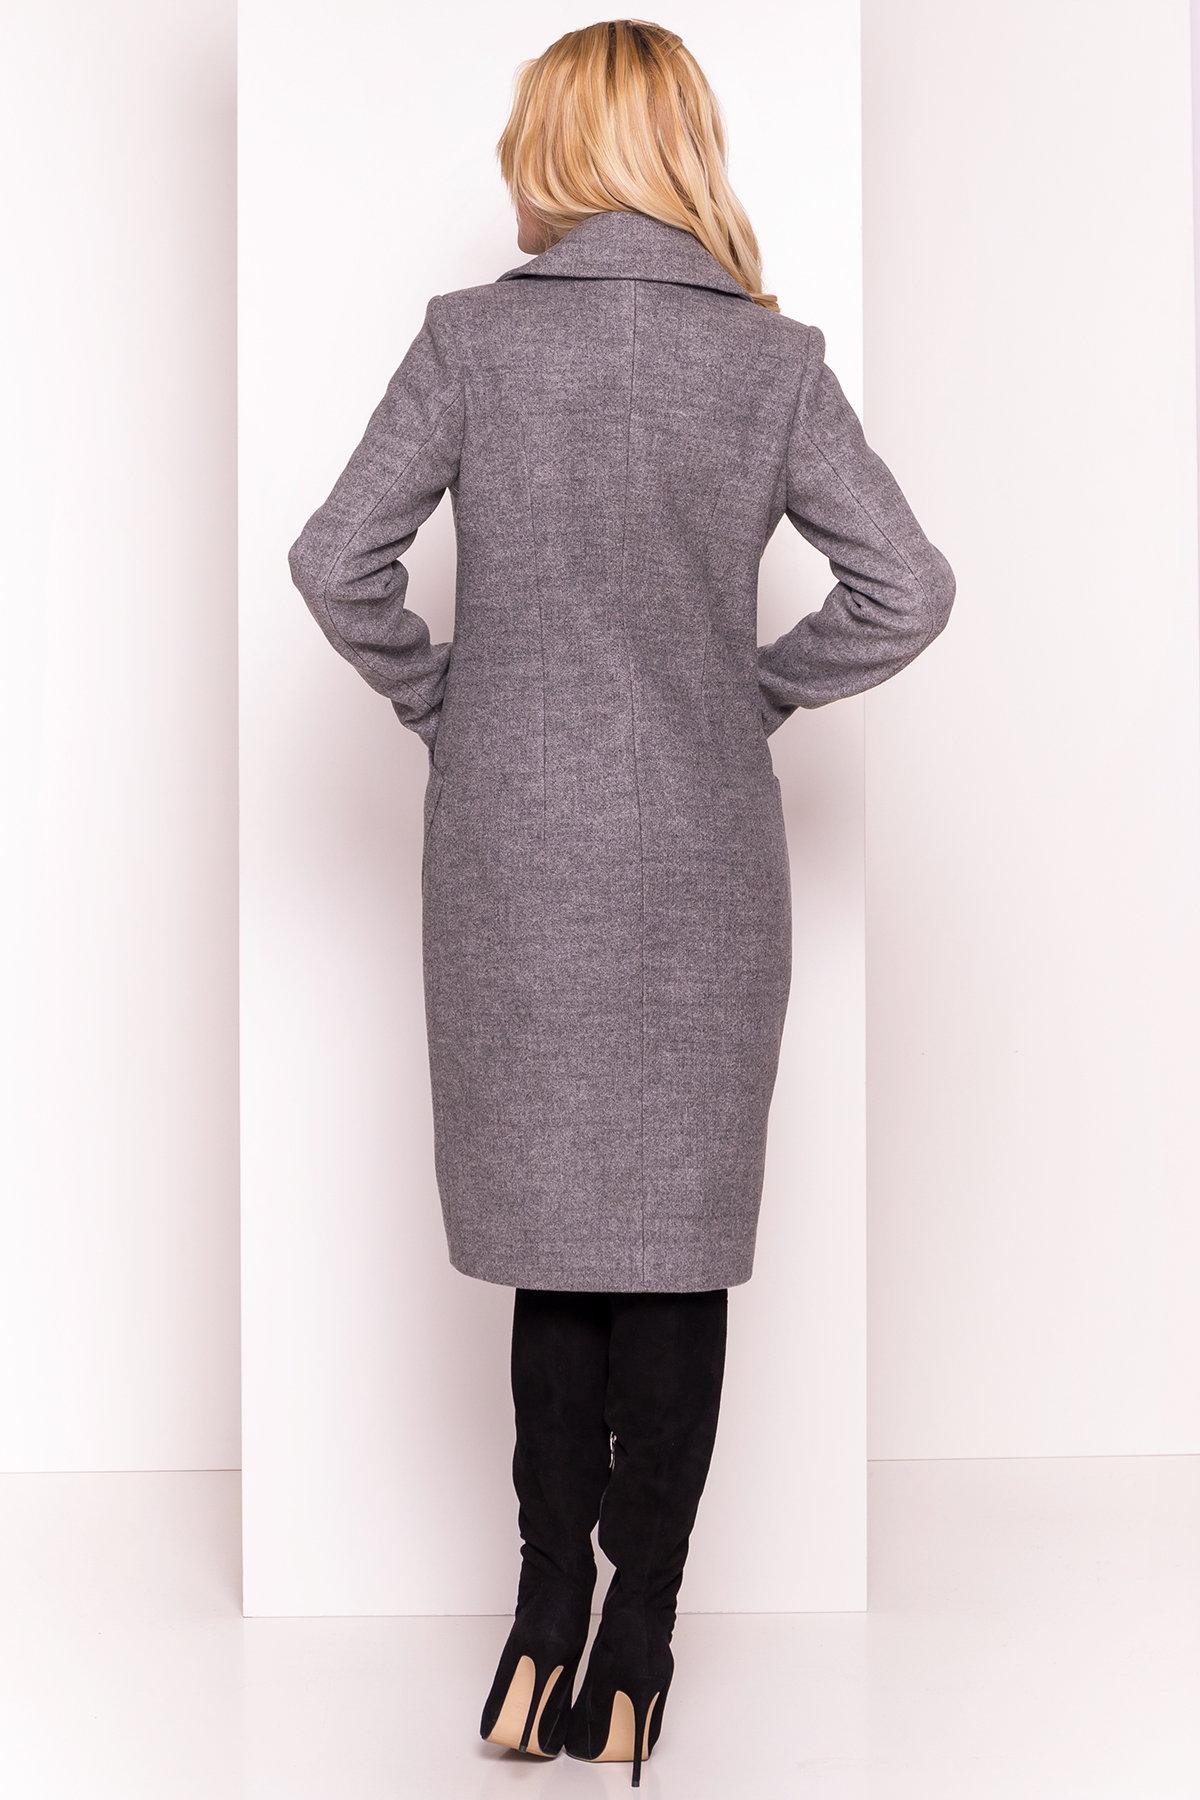 Пальто Габриэлла 4459 АРТ. 21654 Цвет: Серый 18 - фото 4, интернет магазин tm-modus.ru